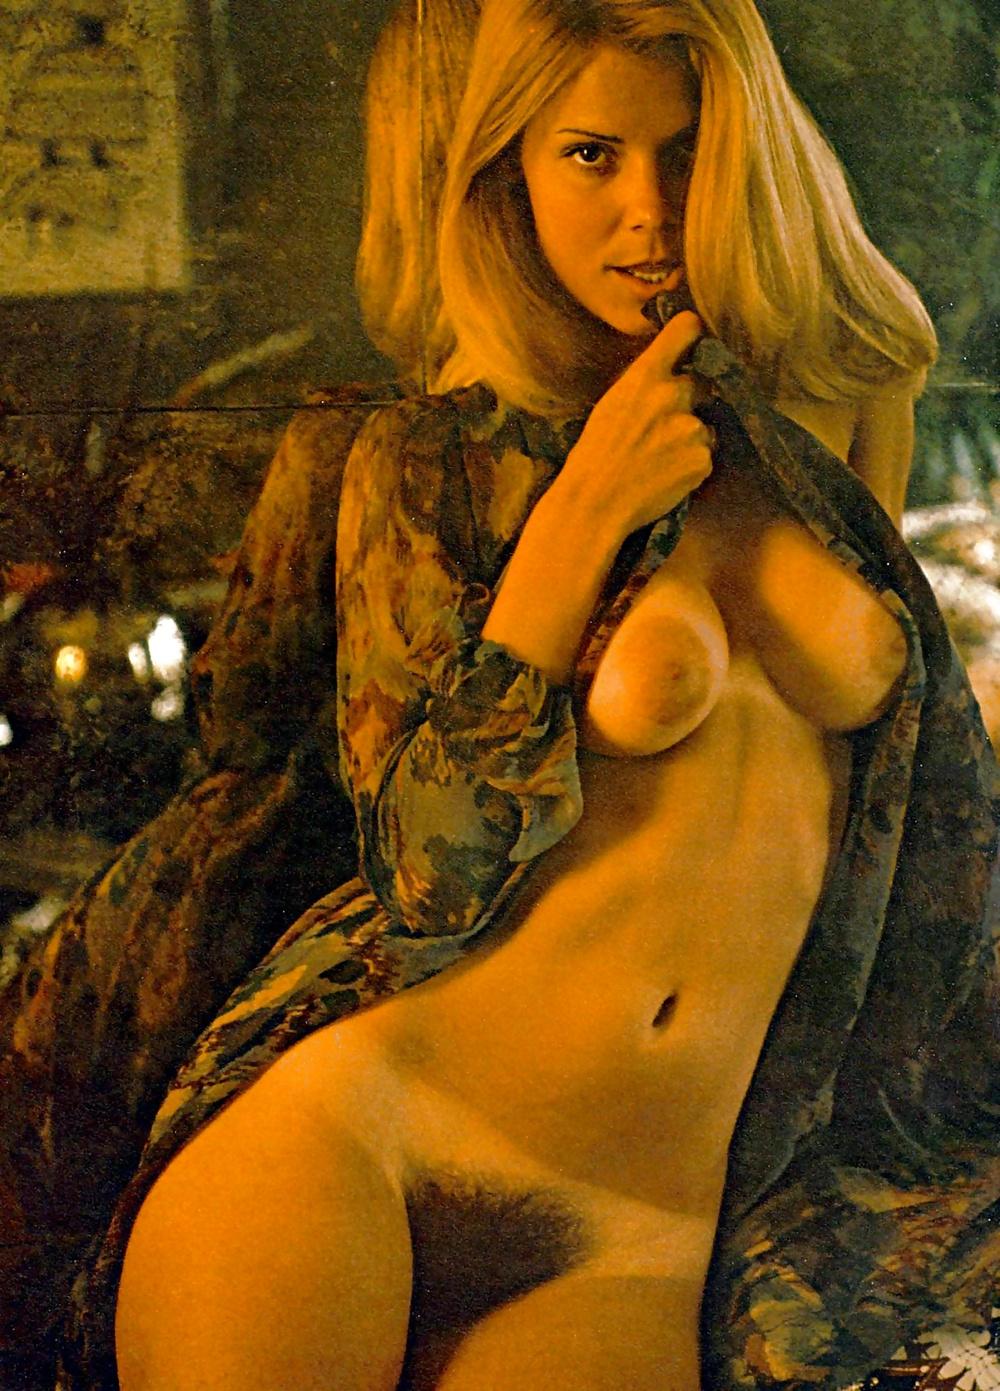 lisa-hanson-naked-nude-milf-motherhood